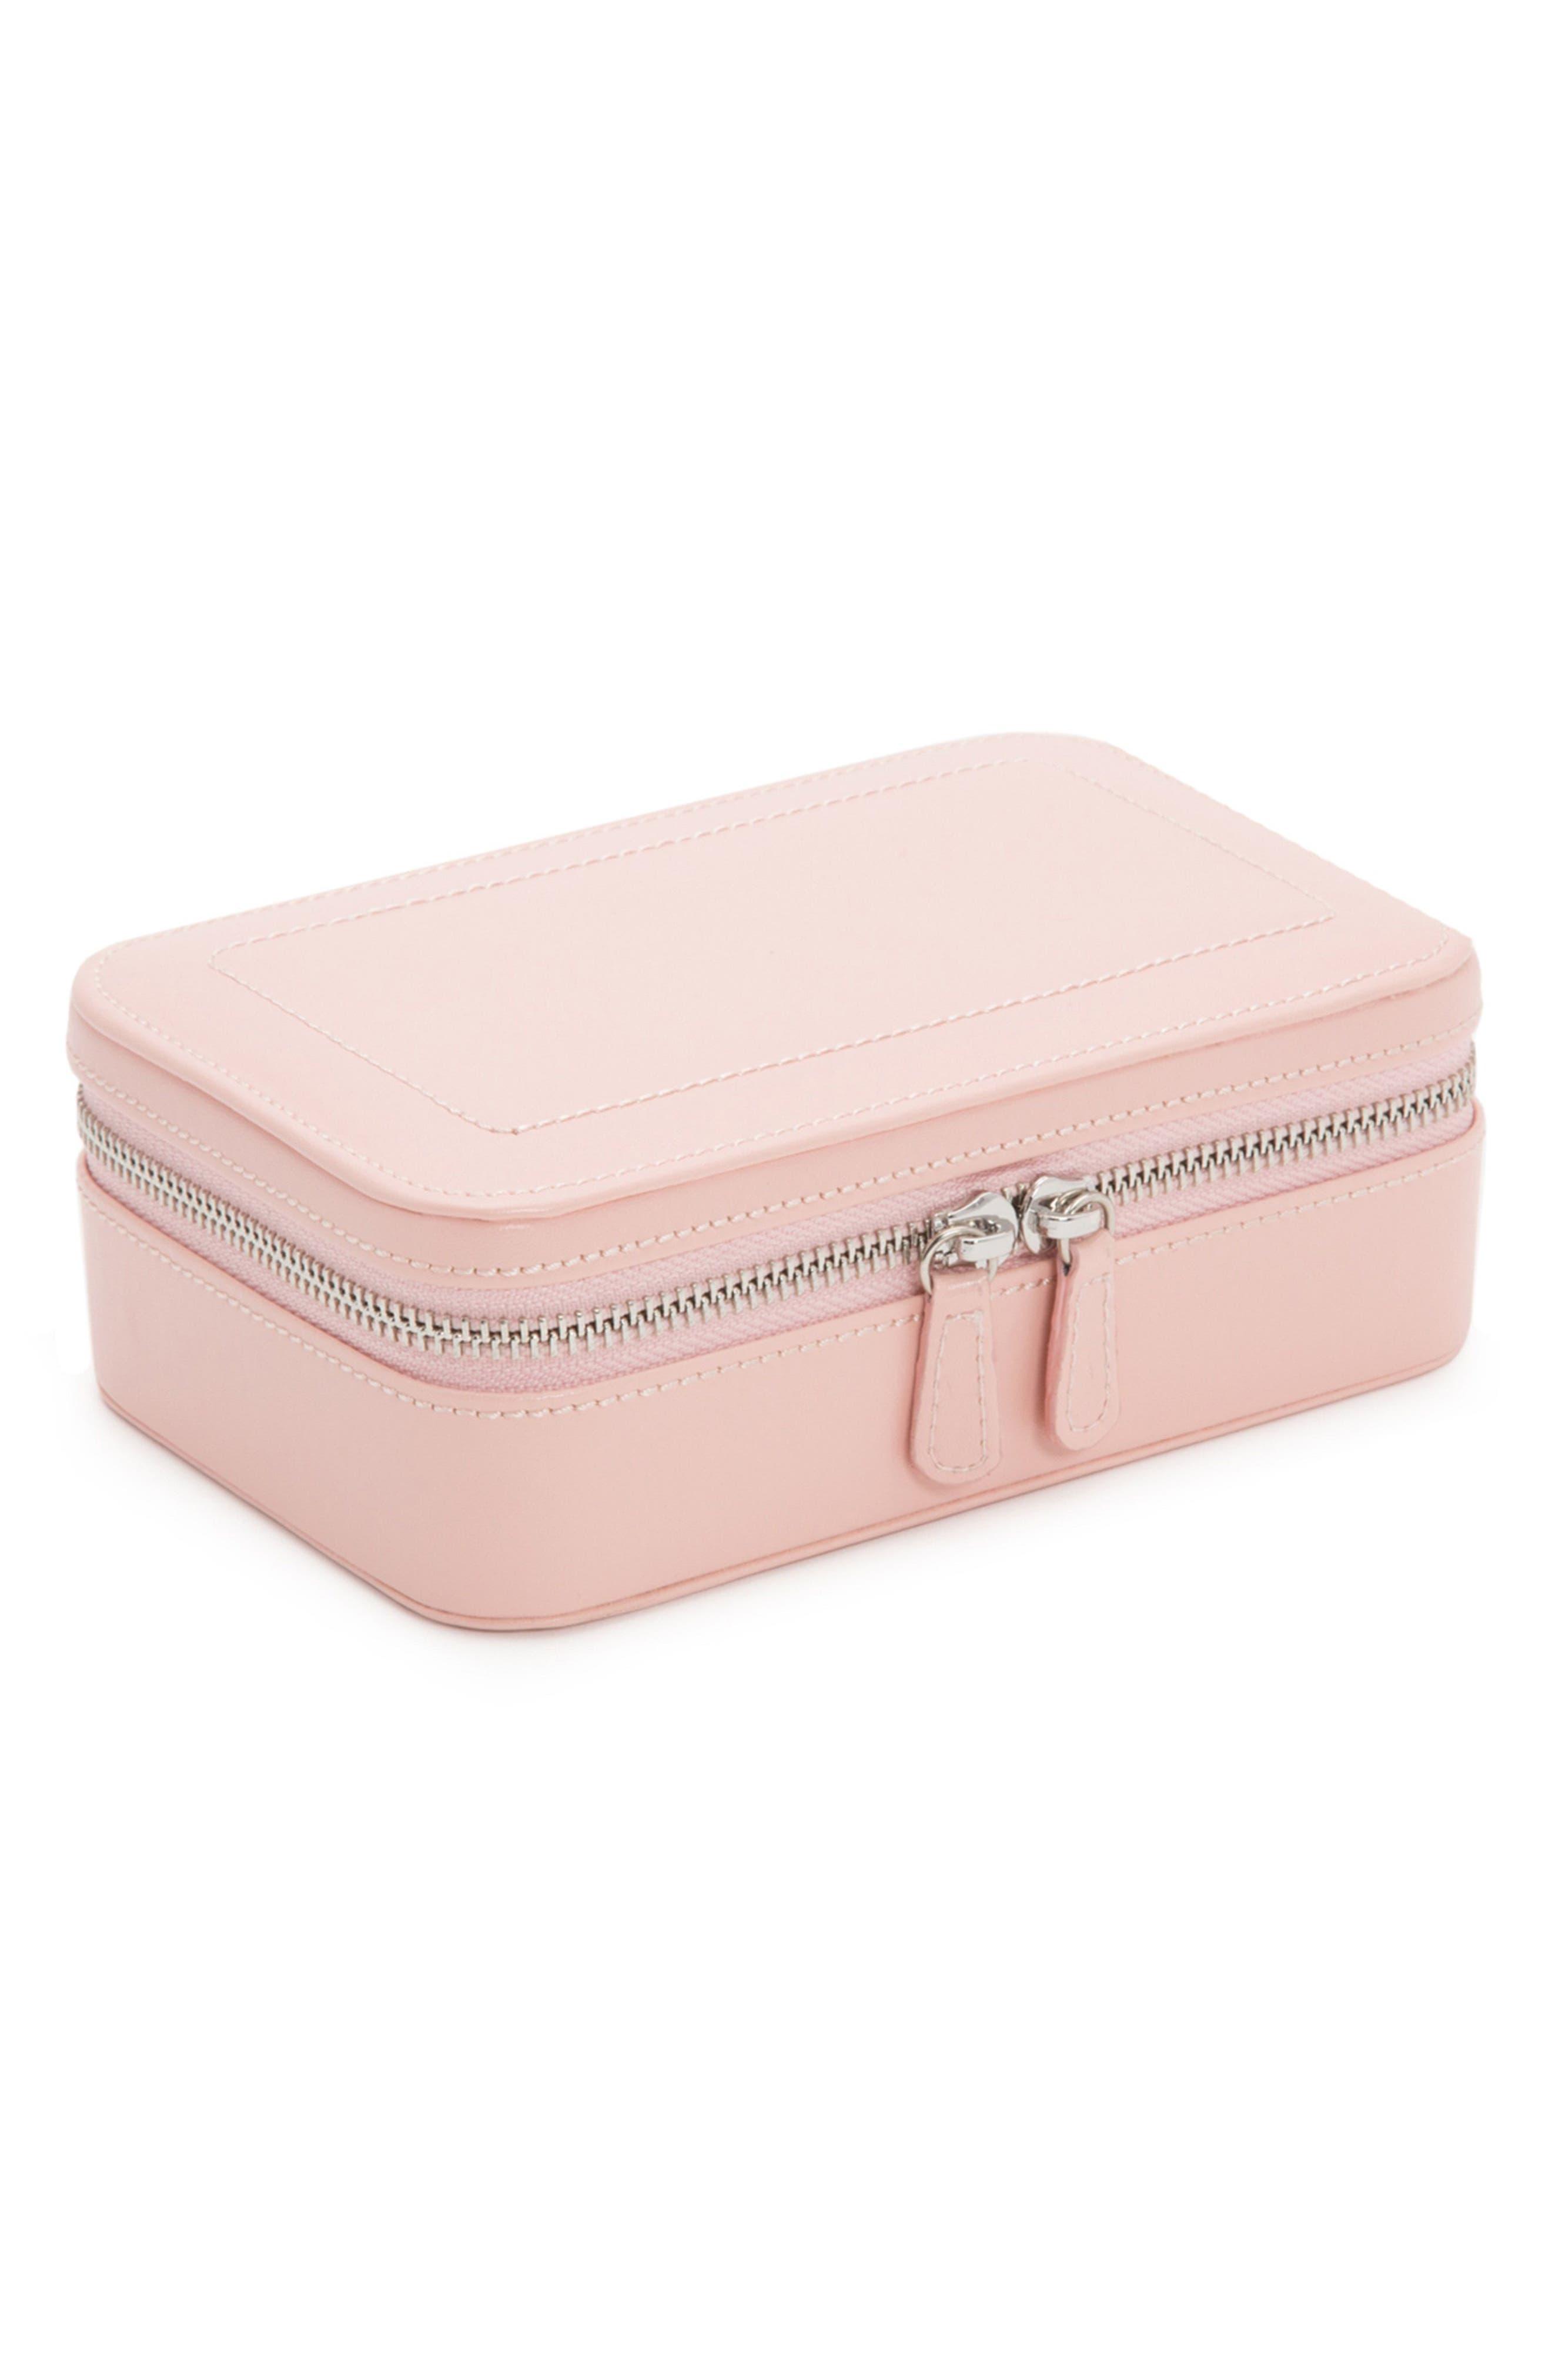 Sophia Rectangle Zip Case,                         Main,                         color, ROSE